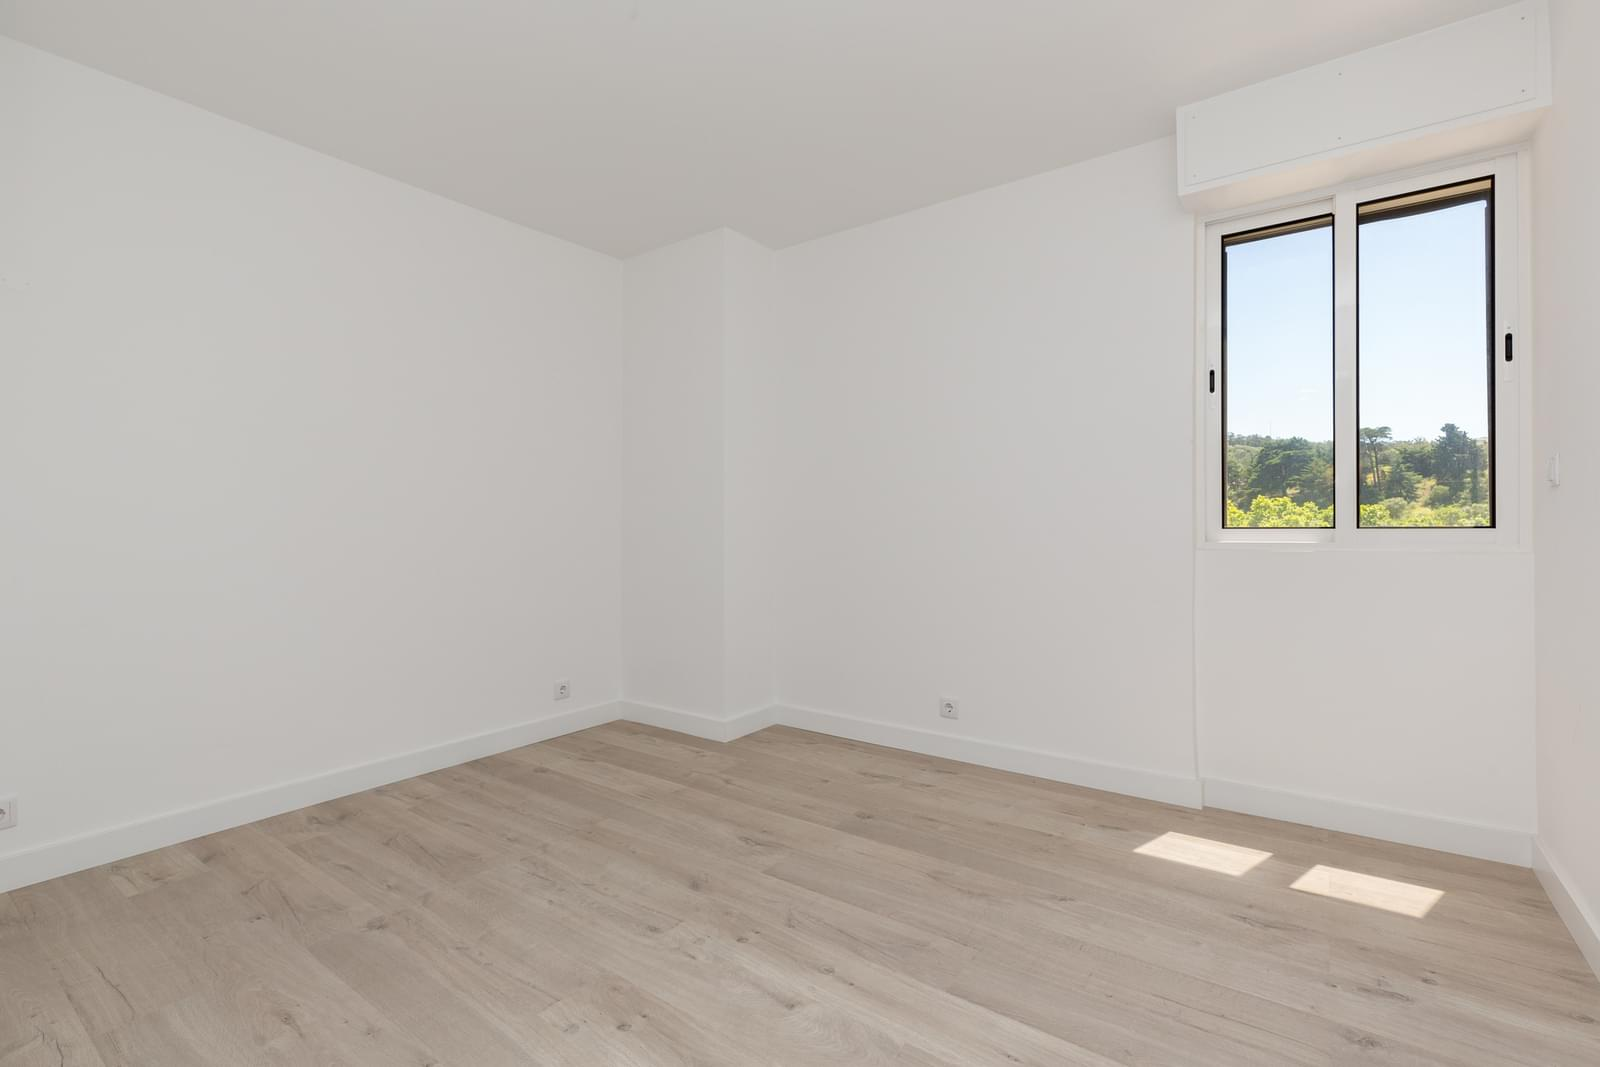 PF22619, Apartamento T4 + 1, Lisboa